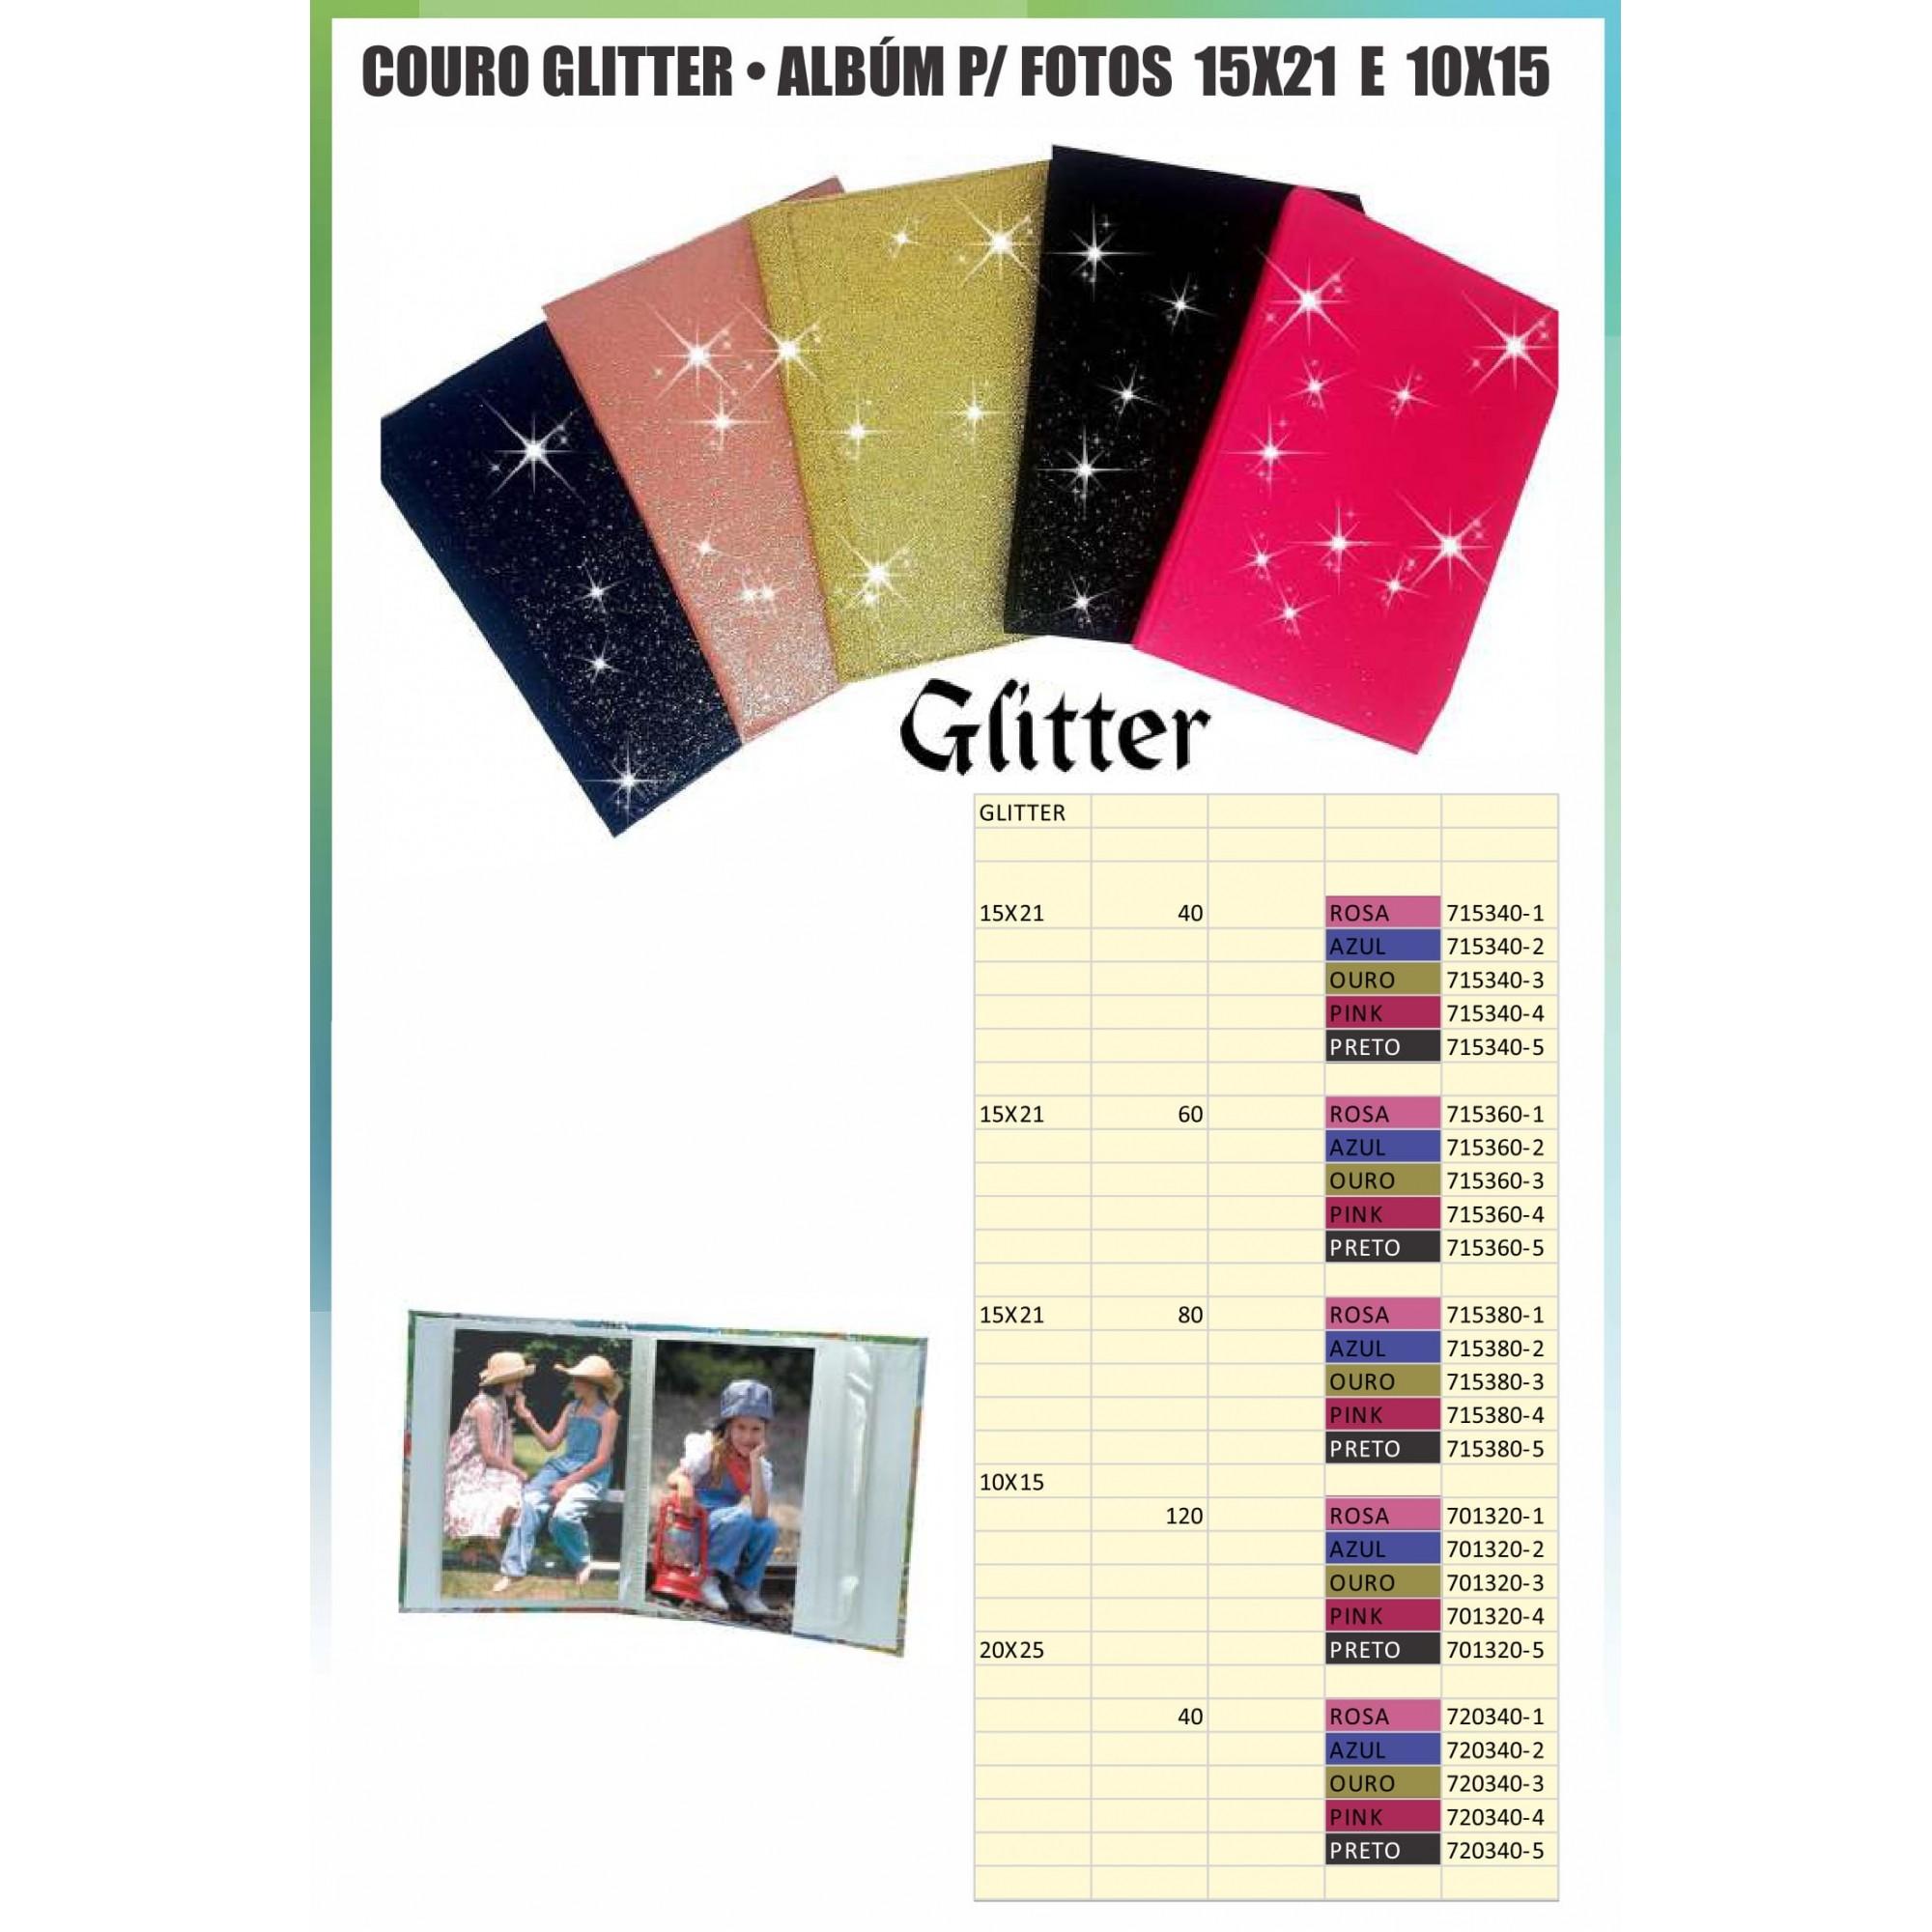 4  Album 10x15 120 Fotos Veludo Couro Ou Glitter 480 Fotos